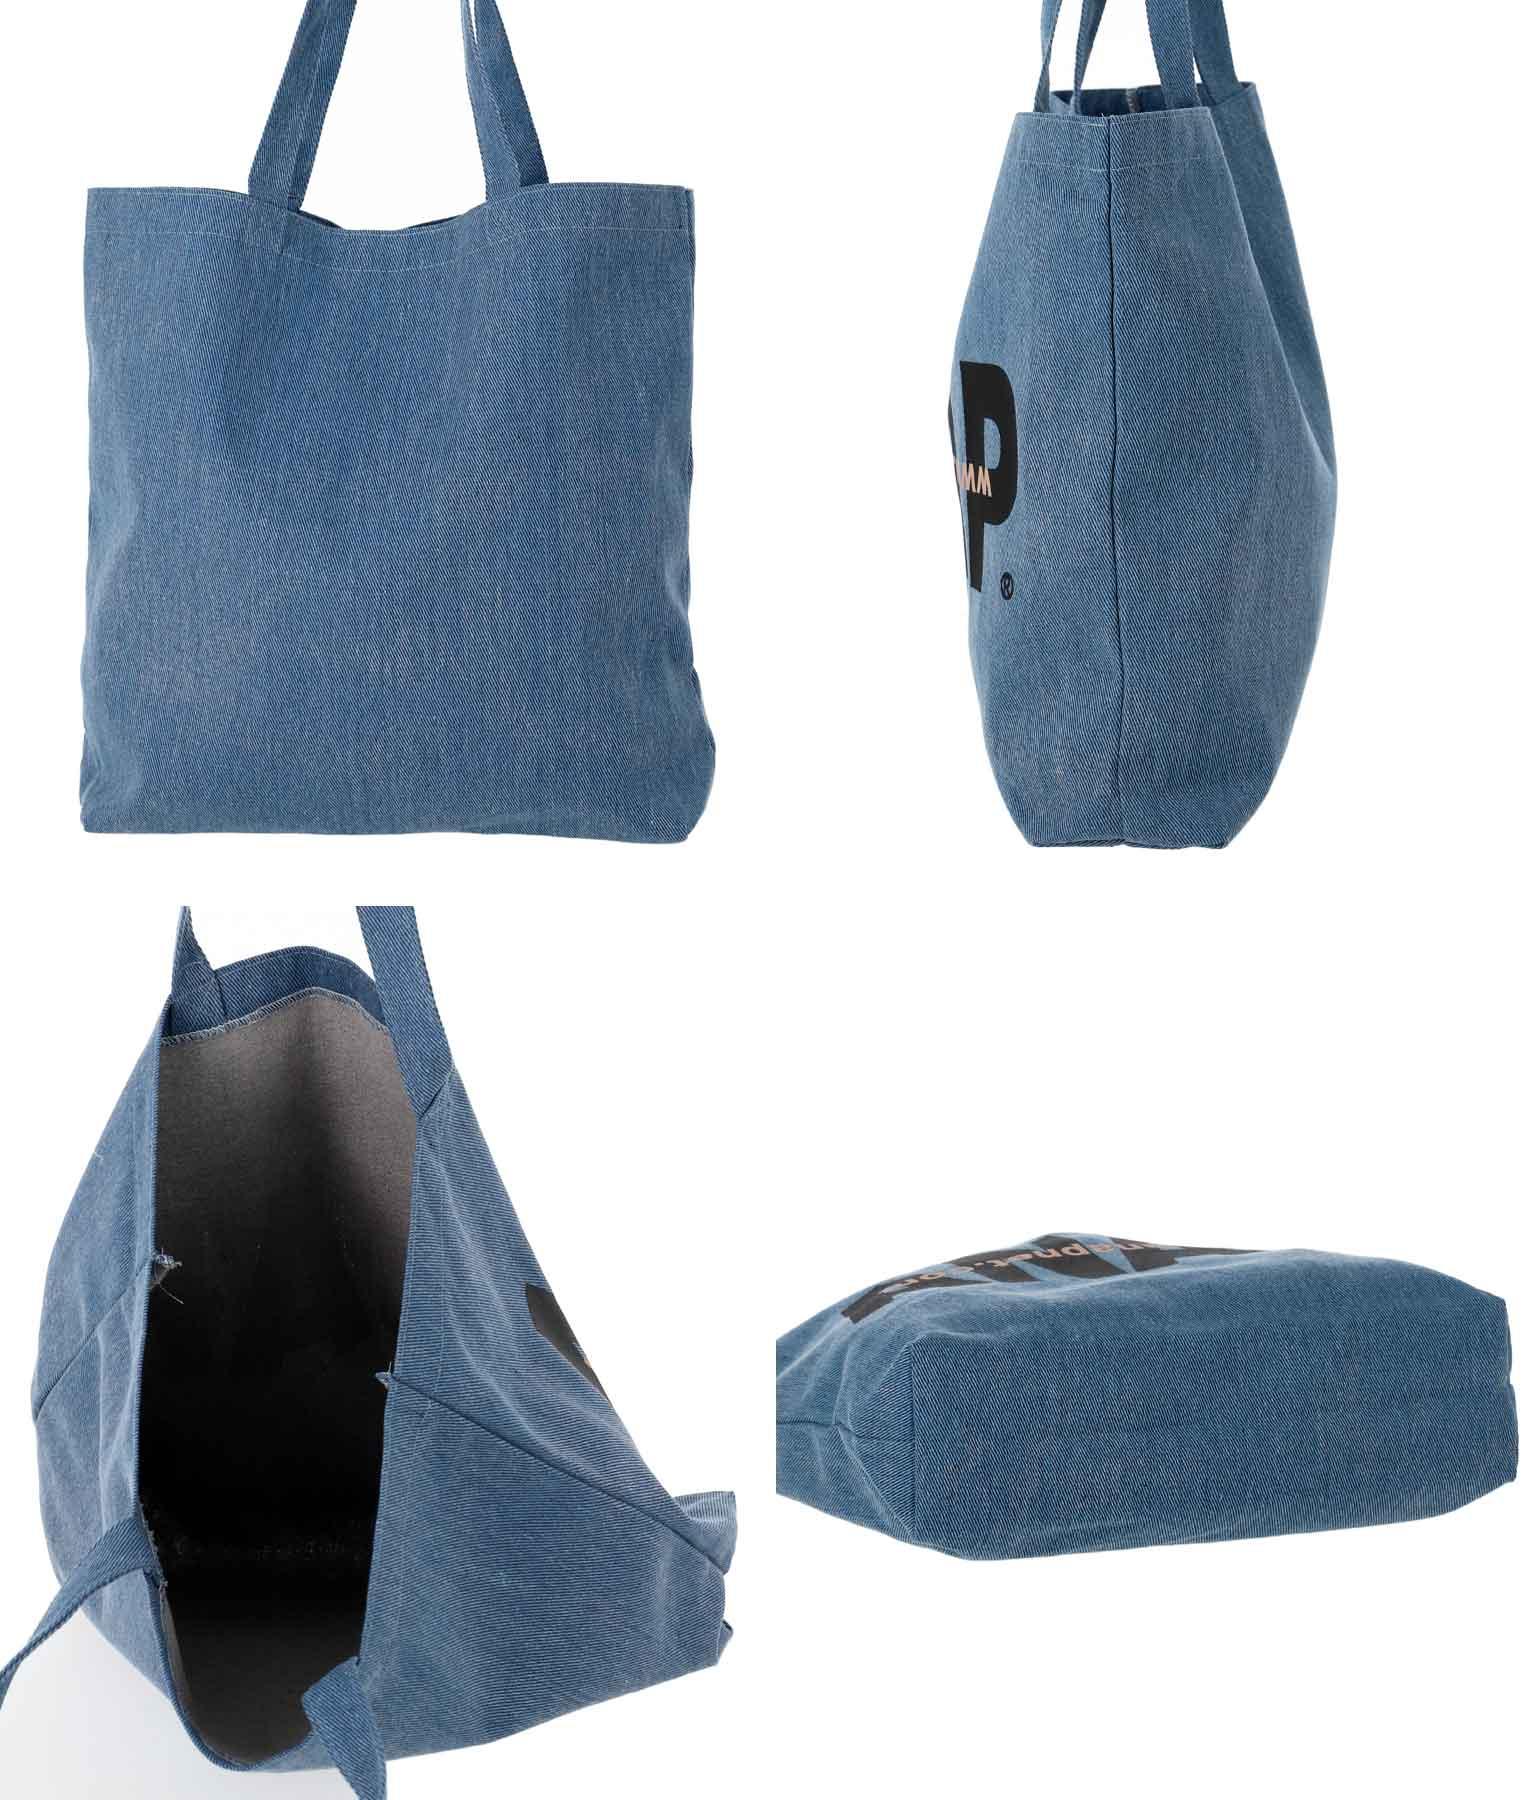 ANAPロゴデニム風バッグ(バッグ・鞄・小物/トートバッグ) | ANAP